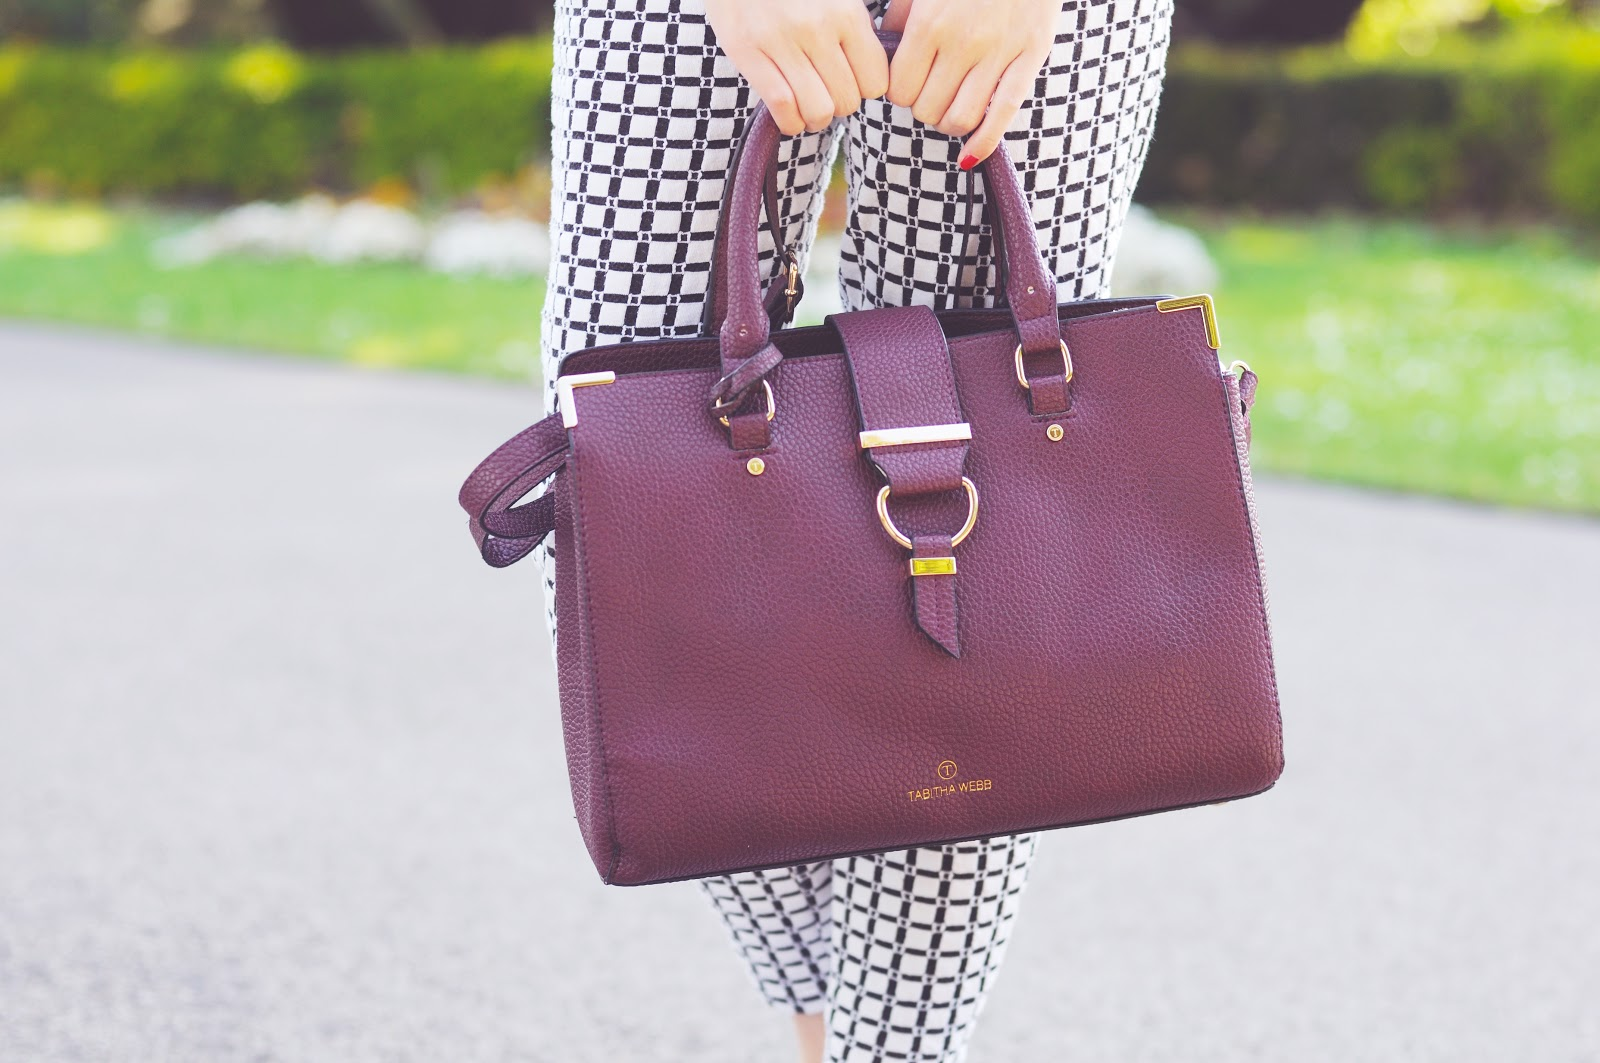 oxblood purple faux leather handbag, tabitha webb avon handbag